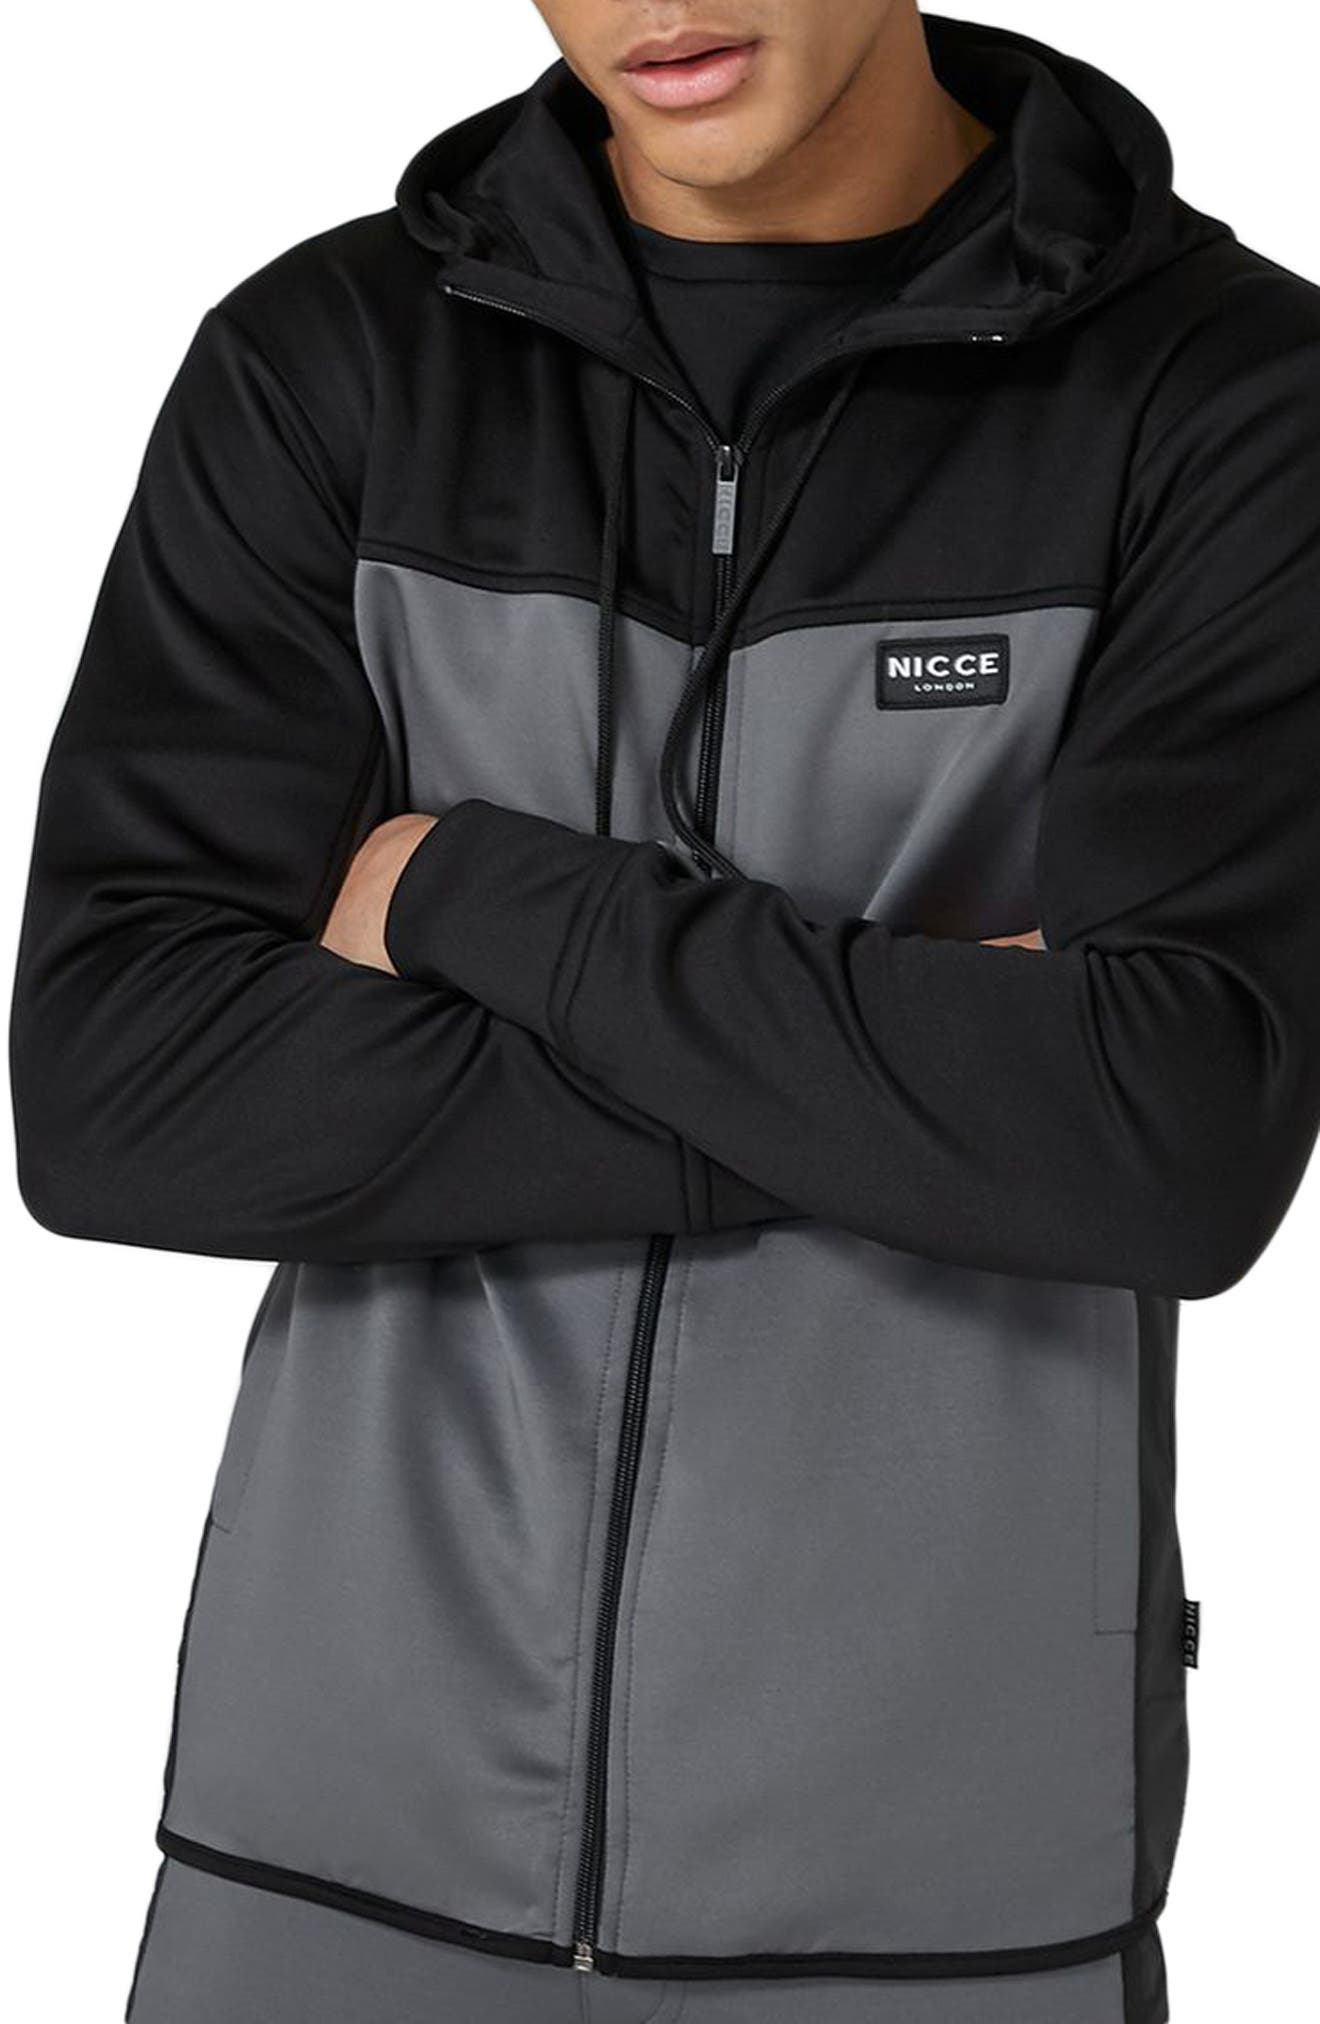 Topshop NICCE Hybrid Track Jacket,                             Main thumbnail 1, color,                             001